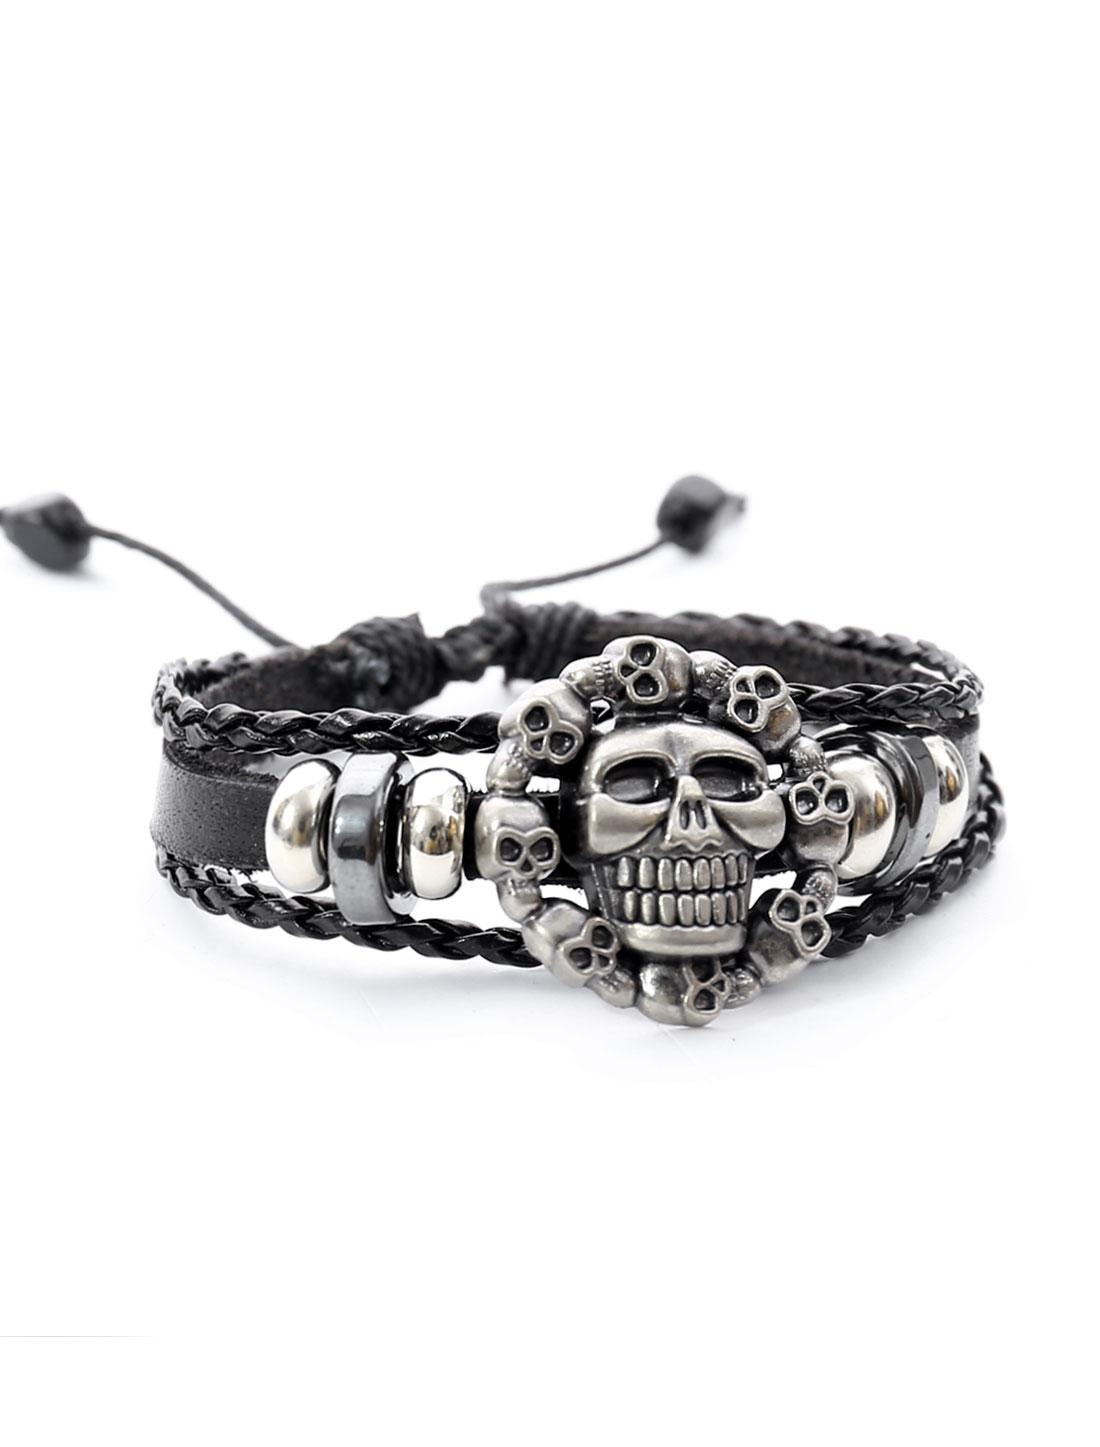 Punk Skulls Leather Charm Wrap Wristband Bracelet Bangle Cuff